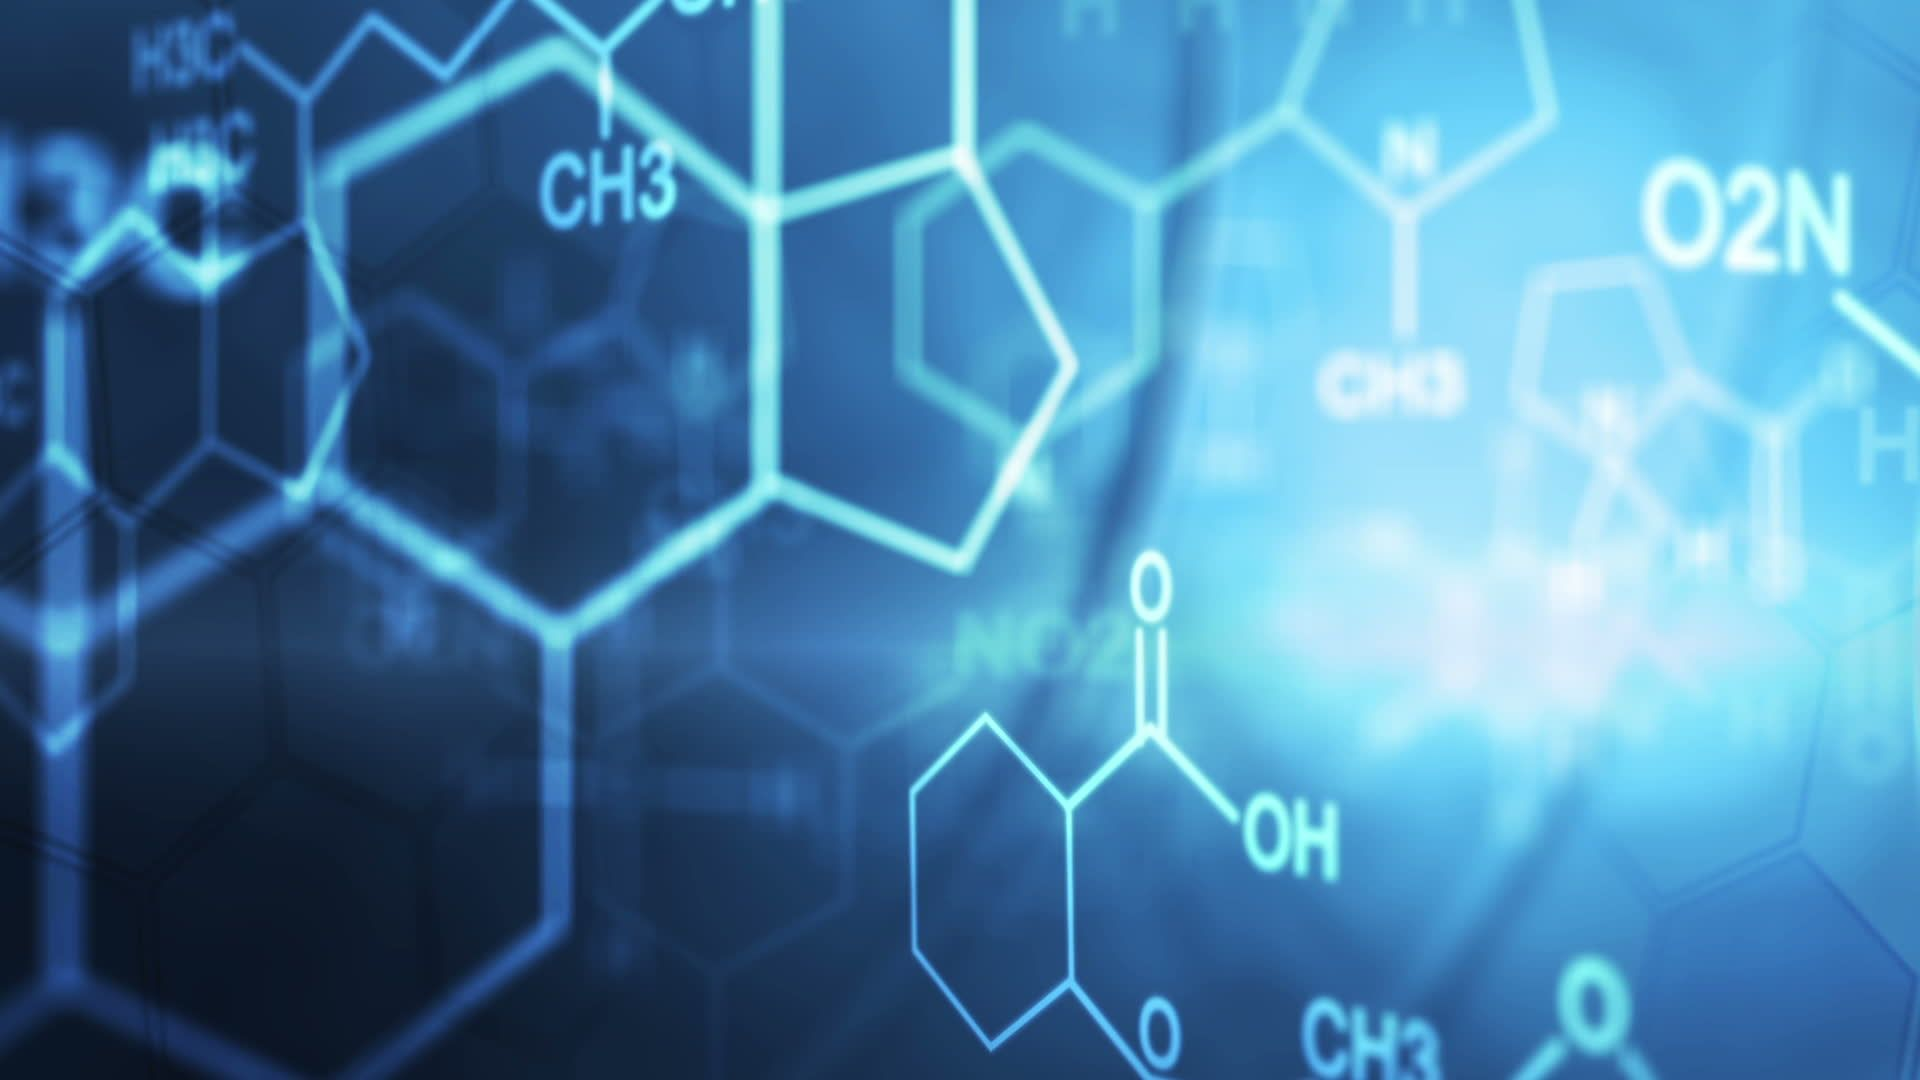 Organic Chemistry Wallpaper - WallpaperSafari | Organic chemistry in 2019 | Pinterest | Science ...